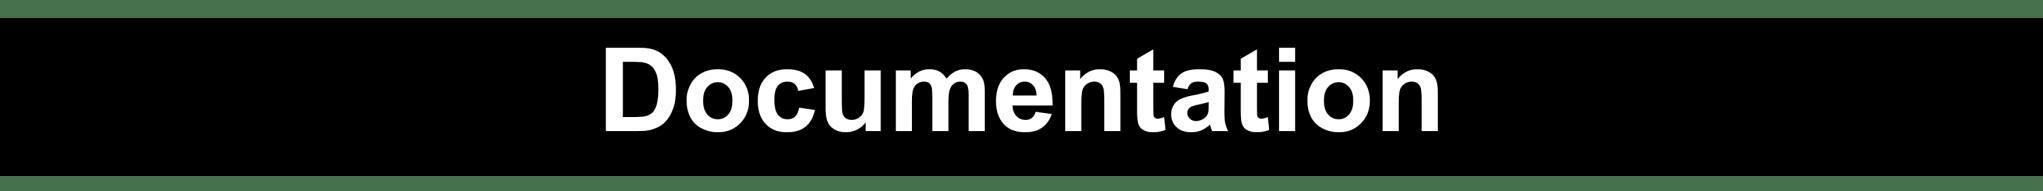 barre-documentation